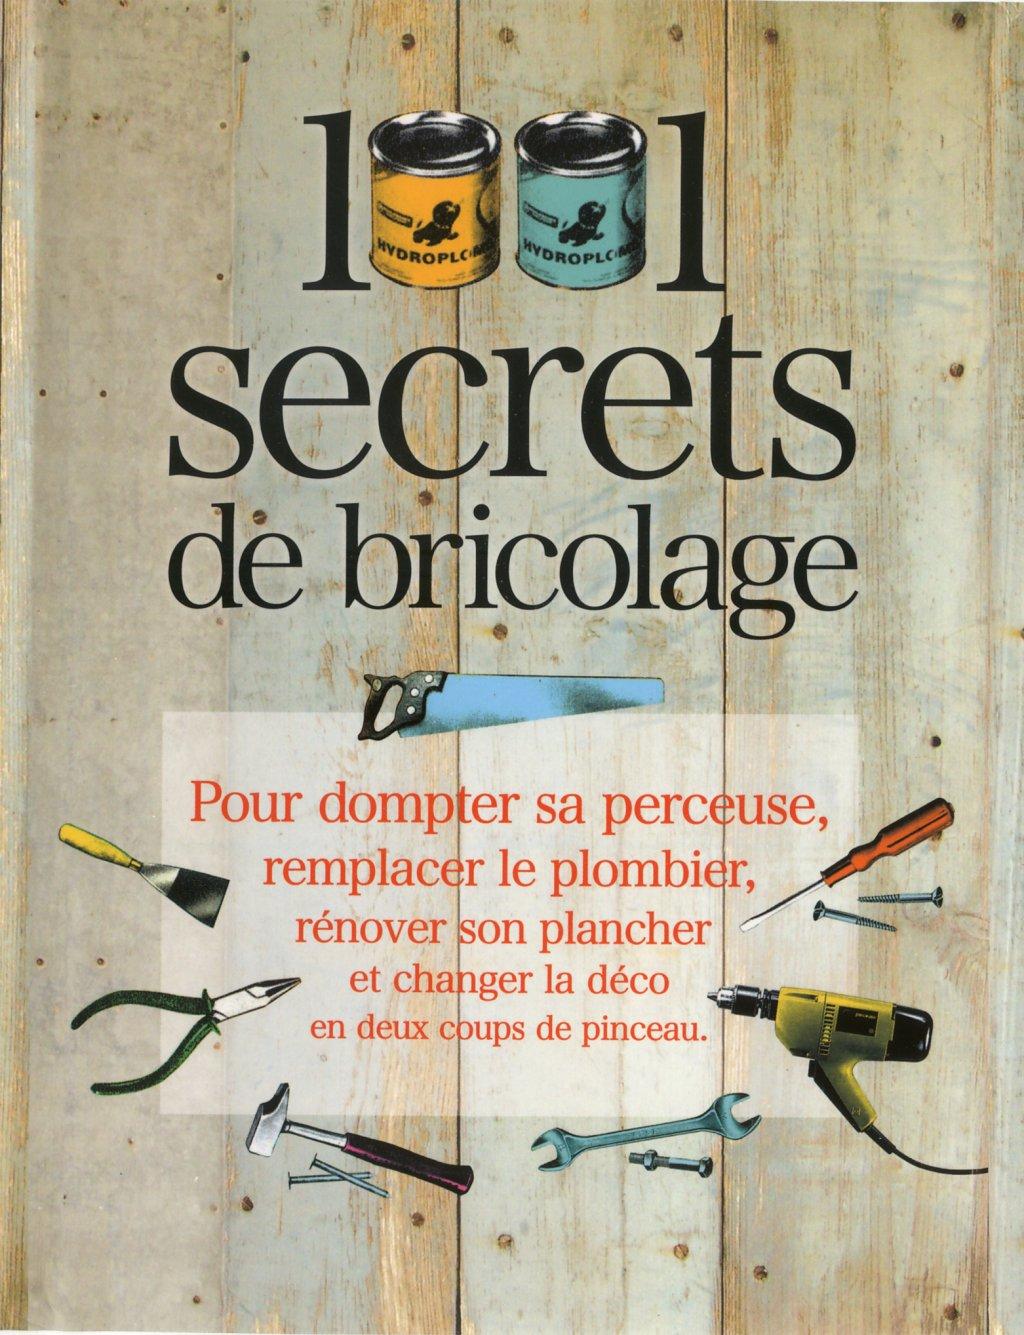 1001 secrets bricolage